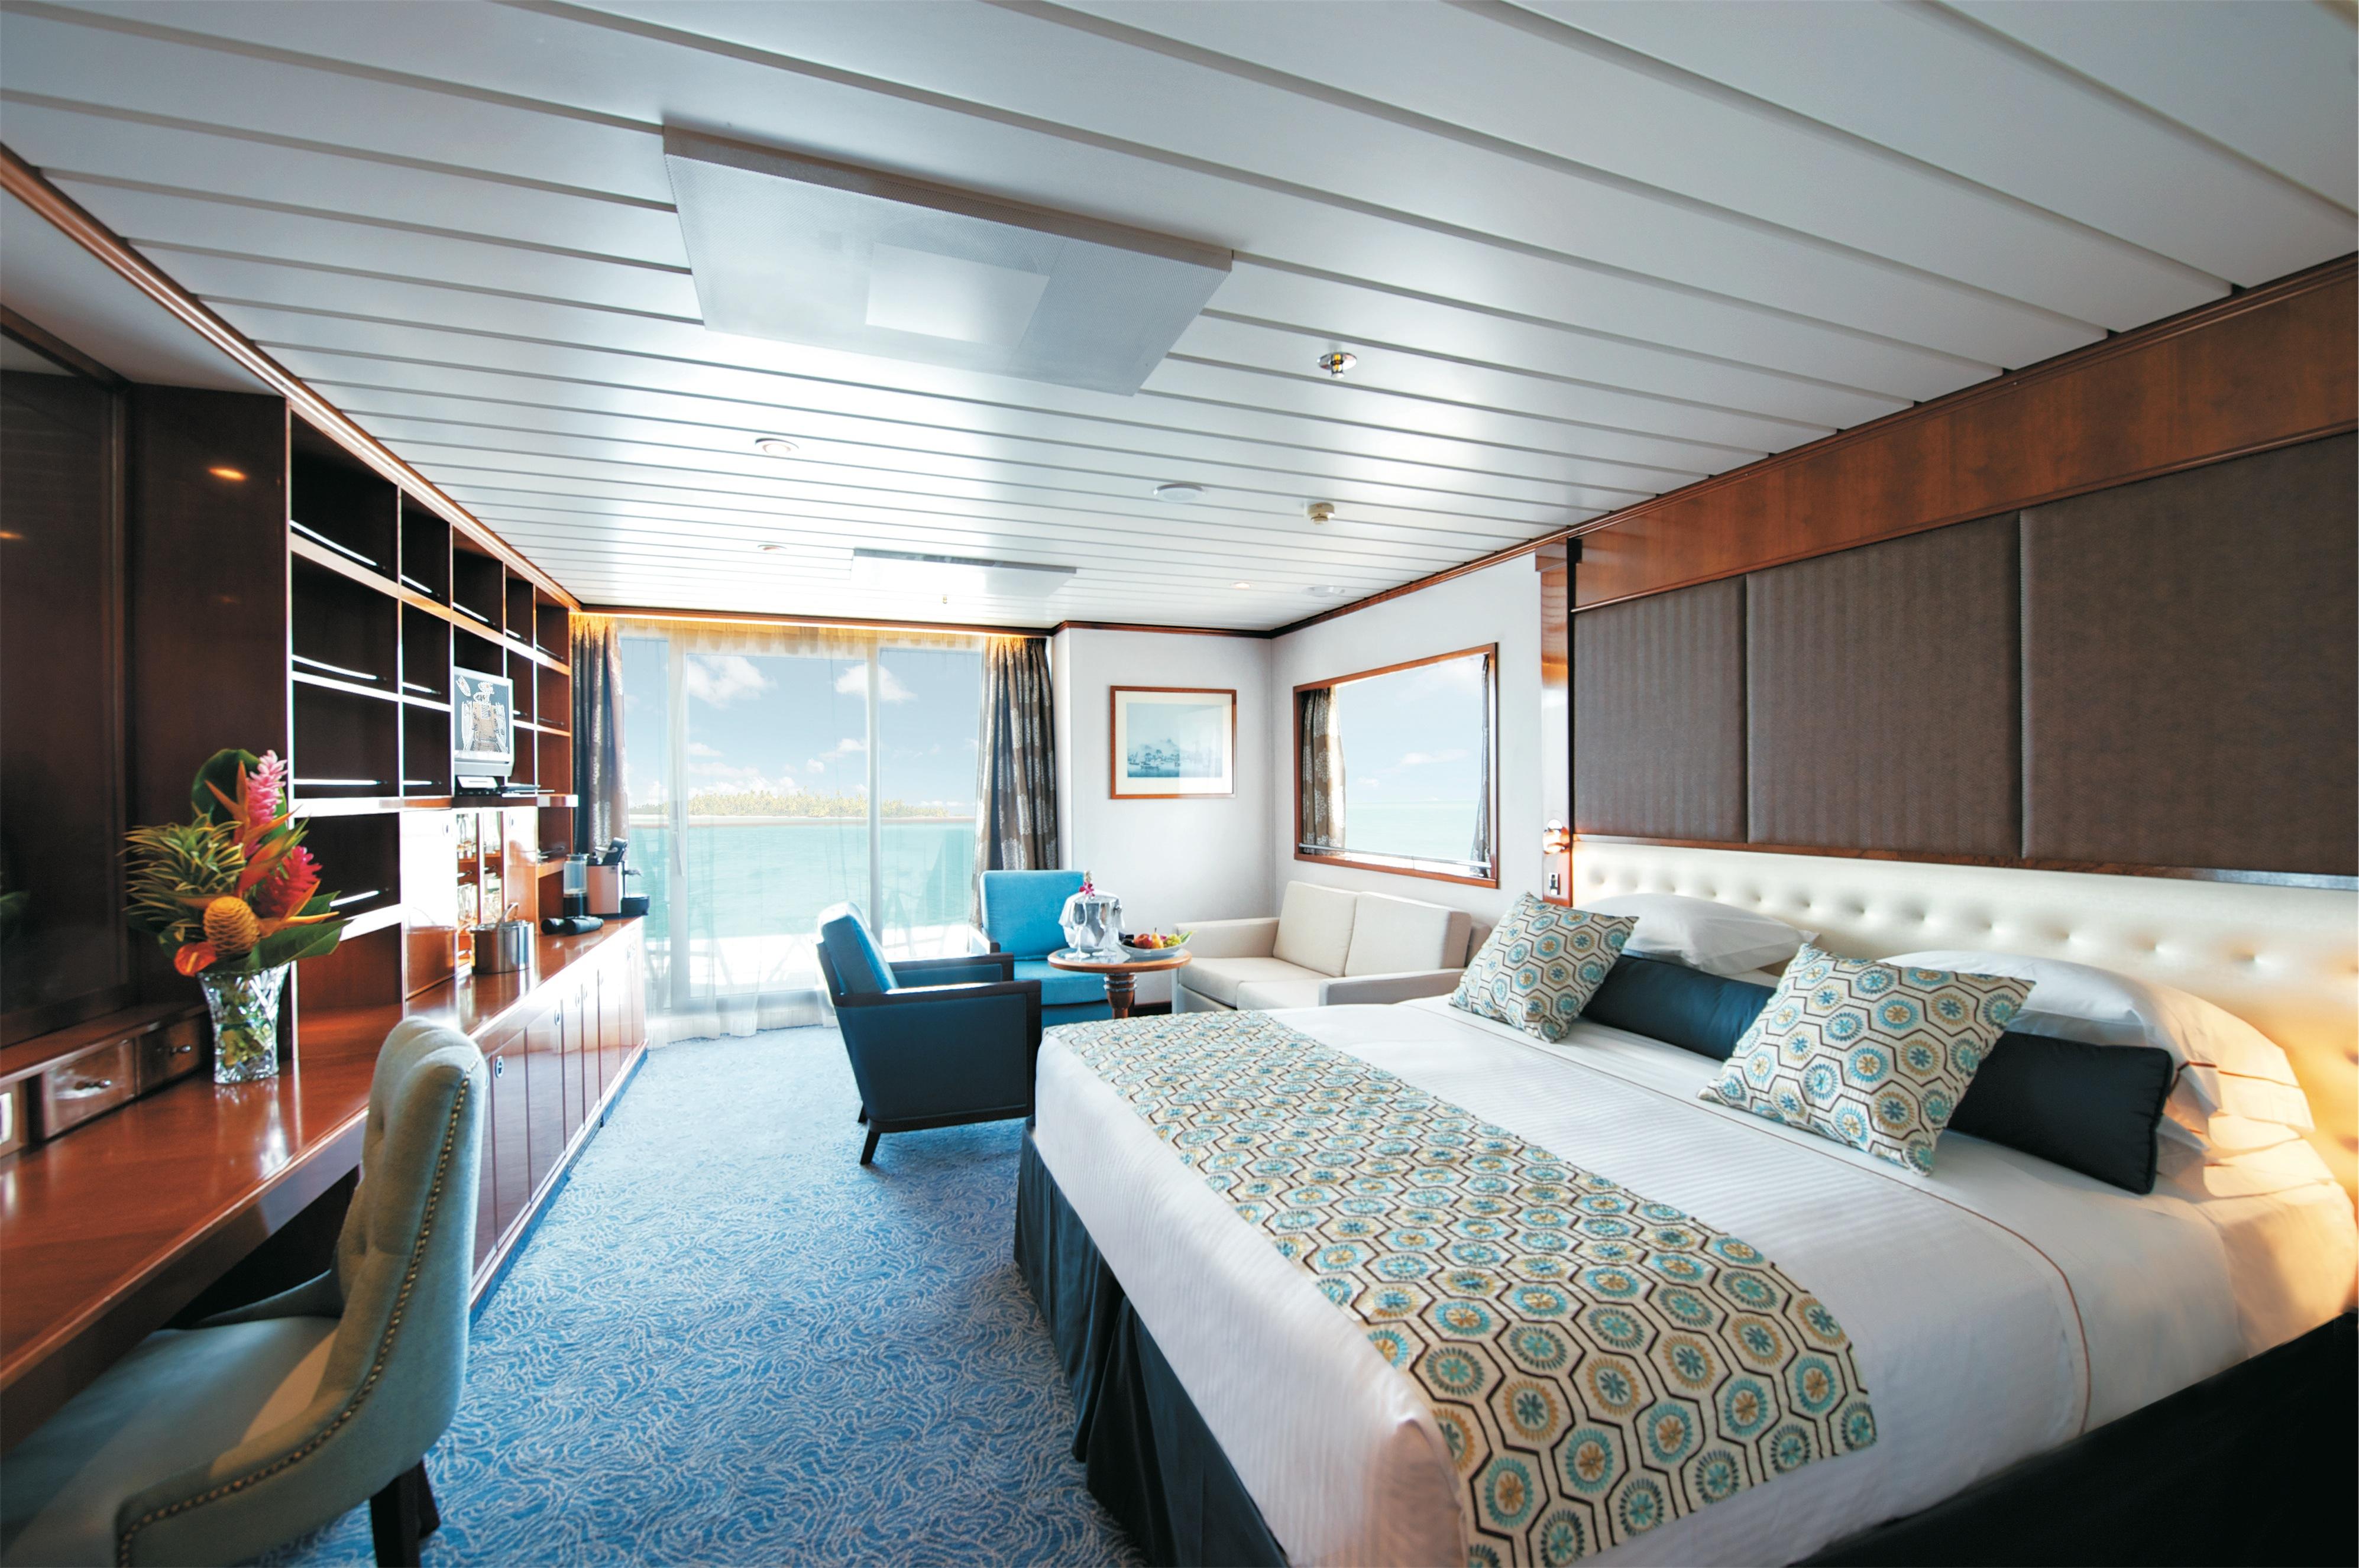 Paul Gauguin MS Paul Gauguin Accommodation Grand Suite 1.jpg